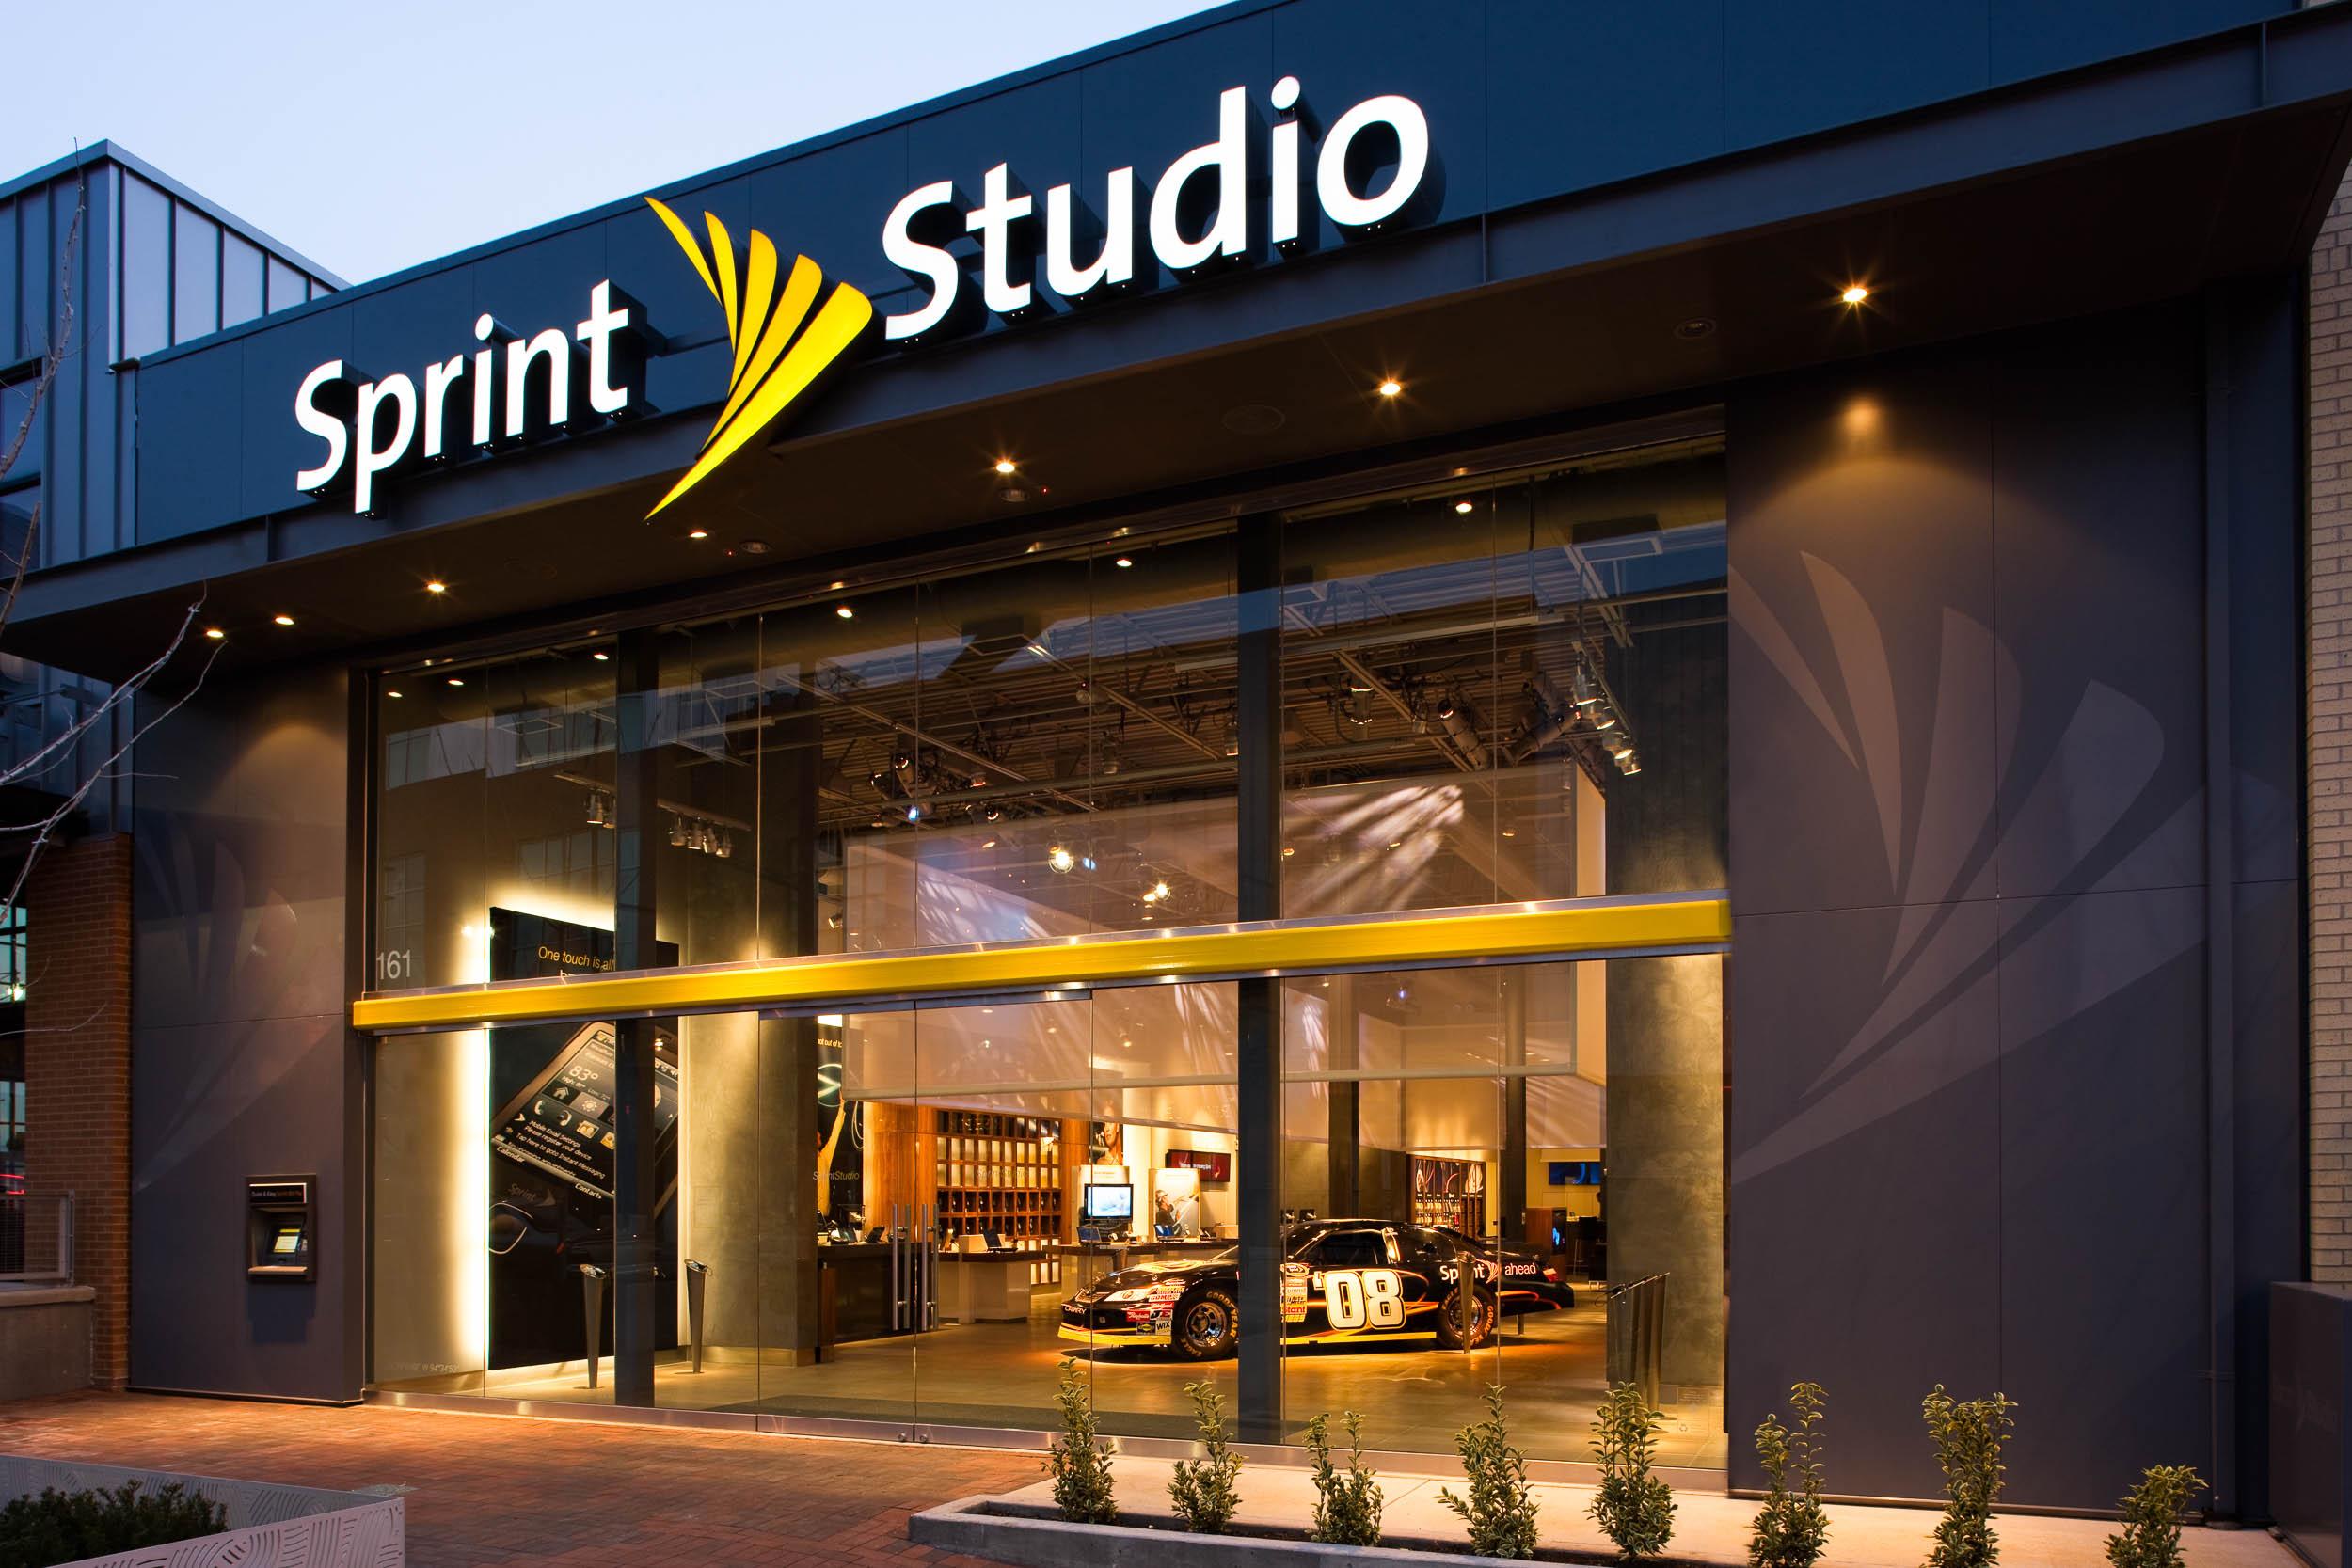 Sprint Studio